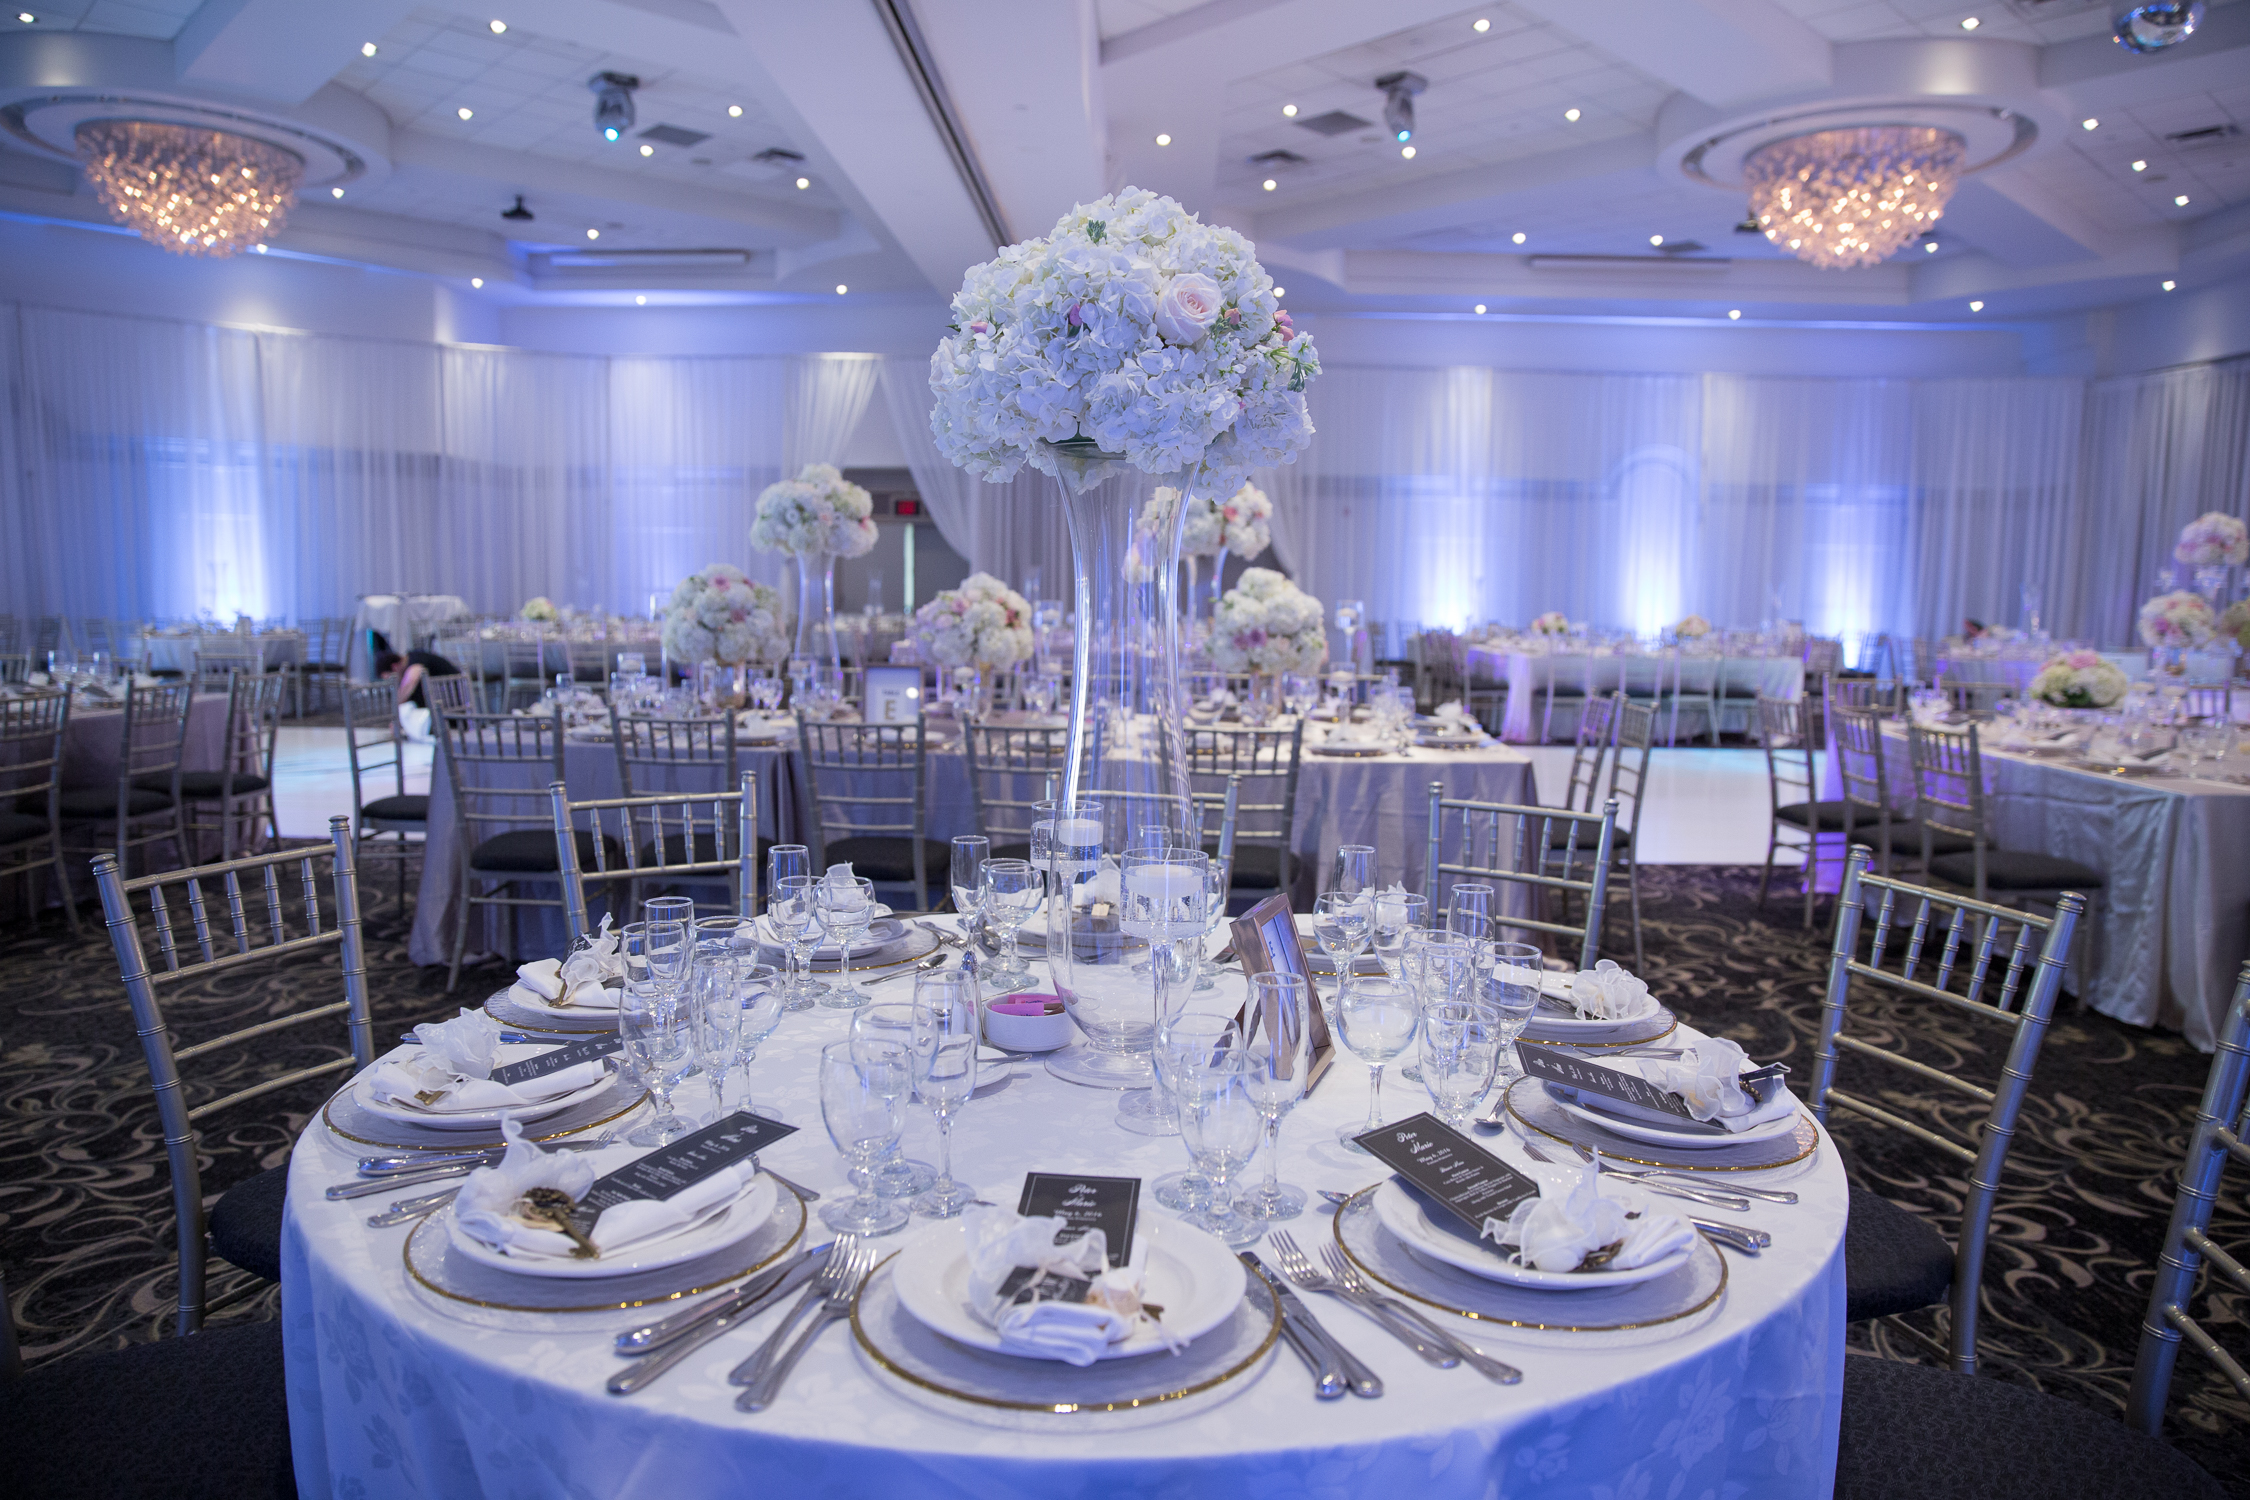 Peter-and-Marie-Wedding-Fontana-Primavera-Graydon-Hall-Manor-Toronto-Ontario-Canada-0031.jpg